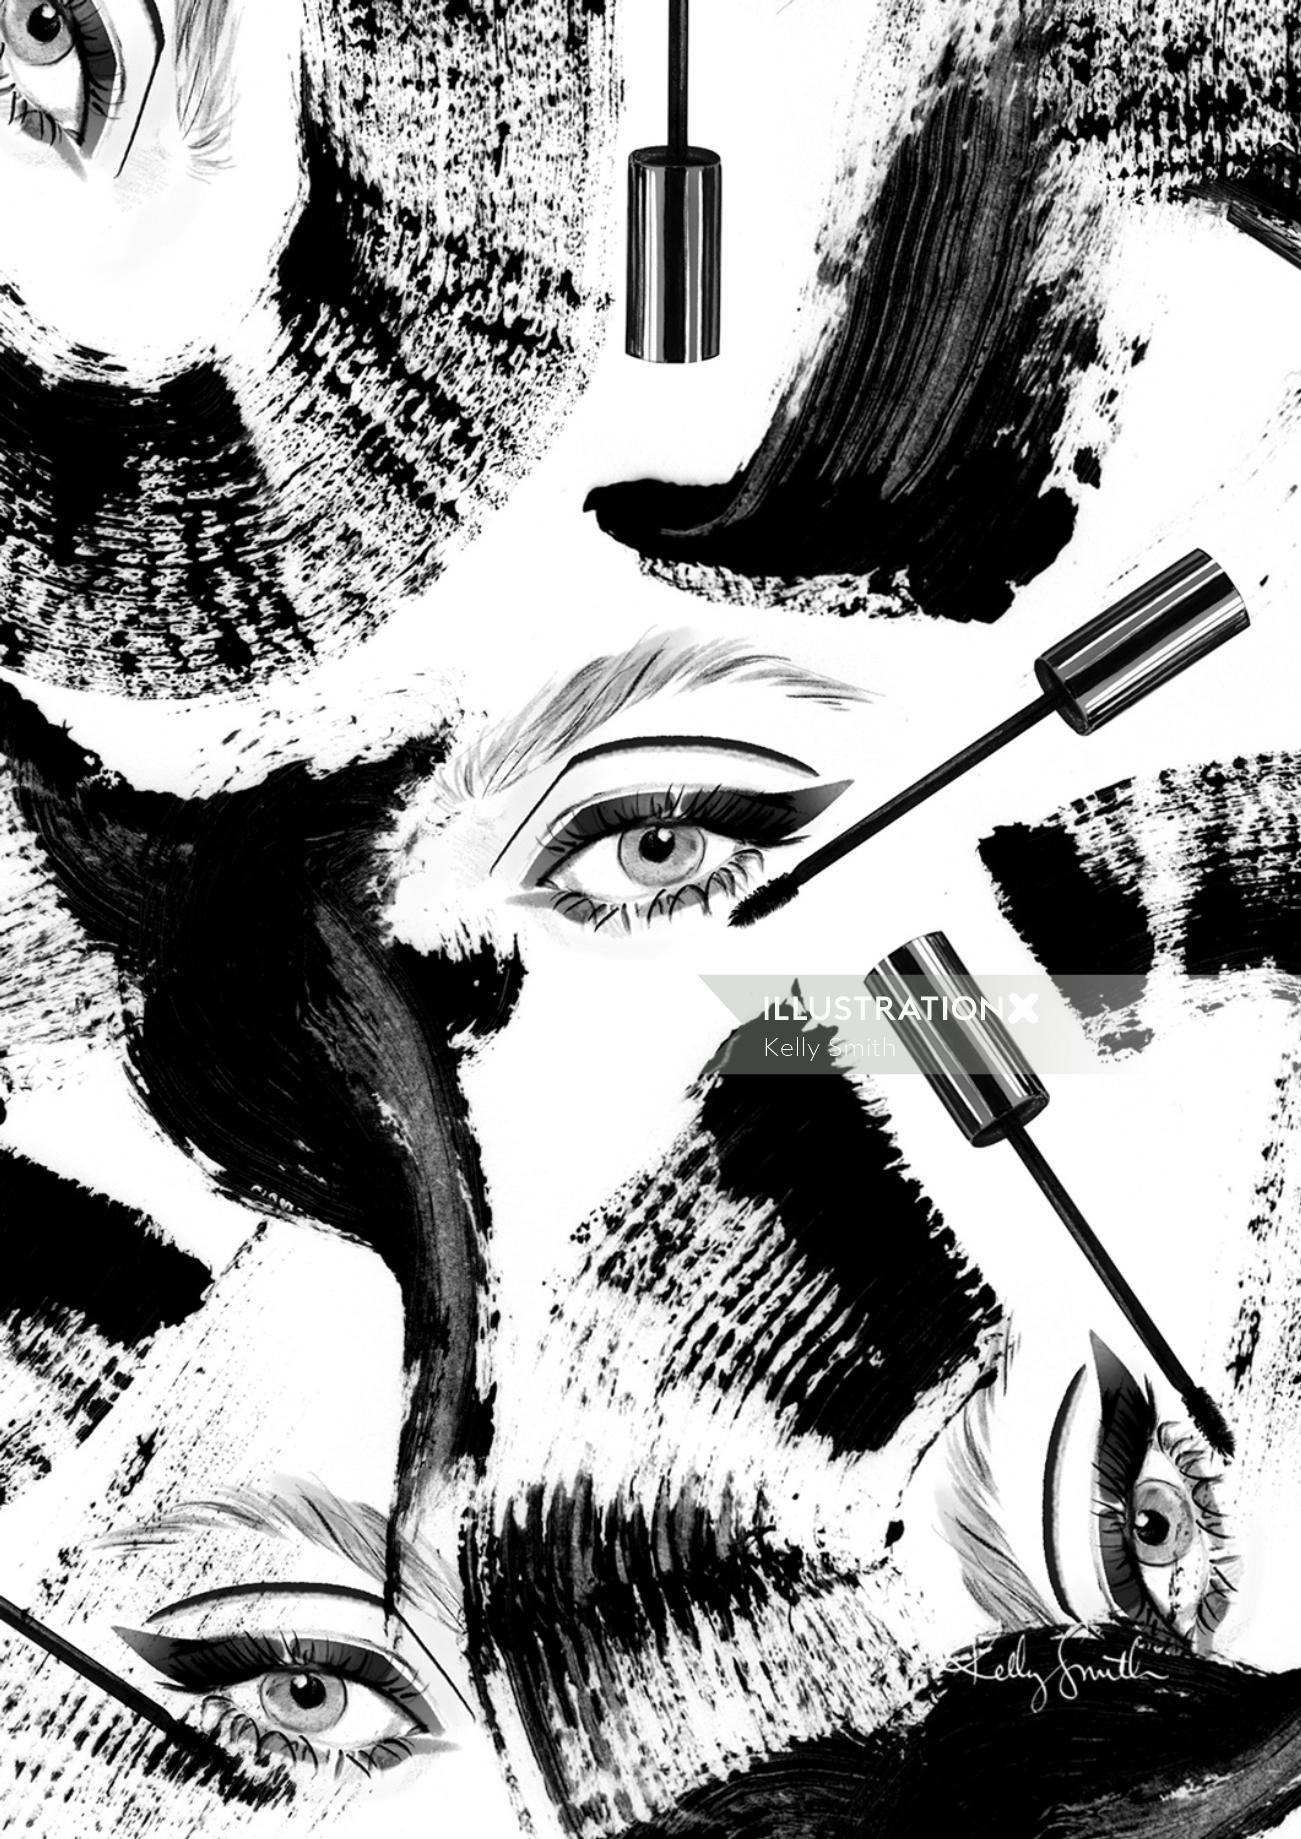 Fashion illustration of mascara swirls